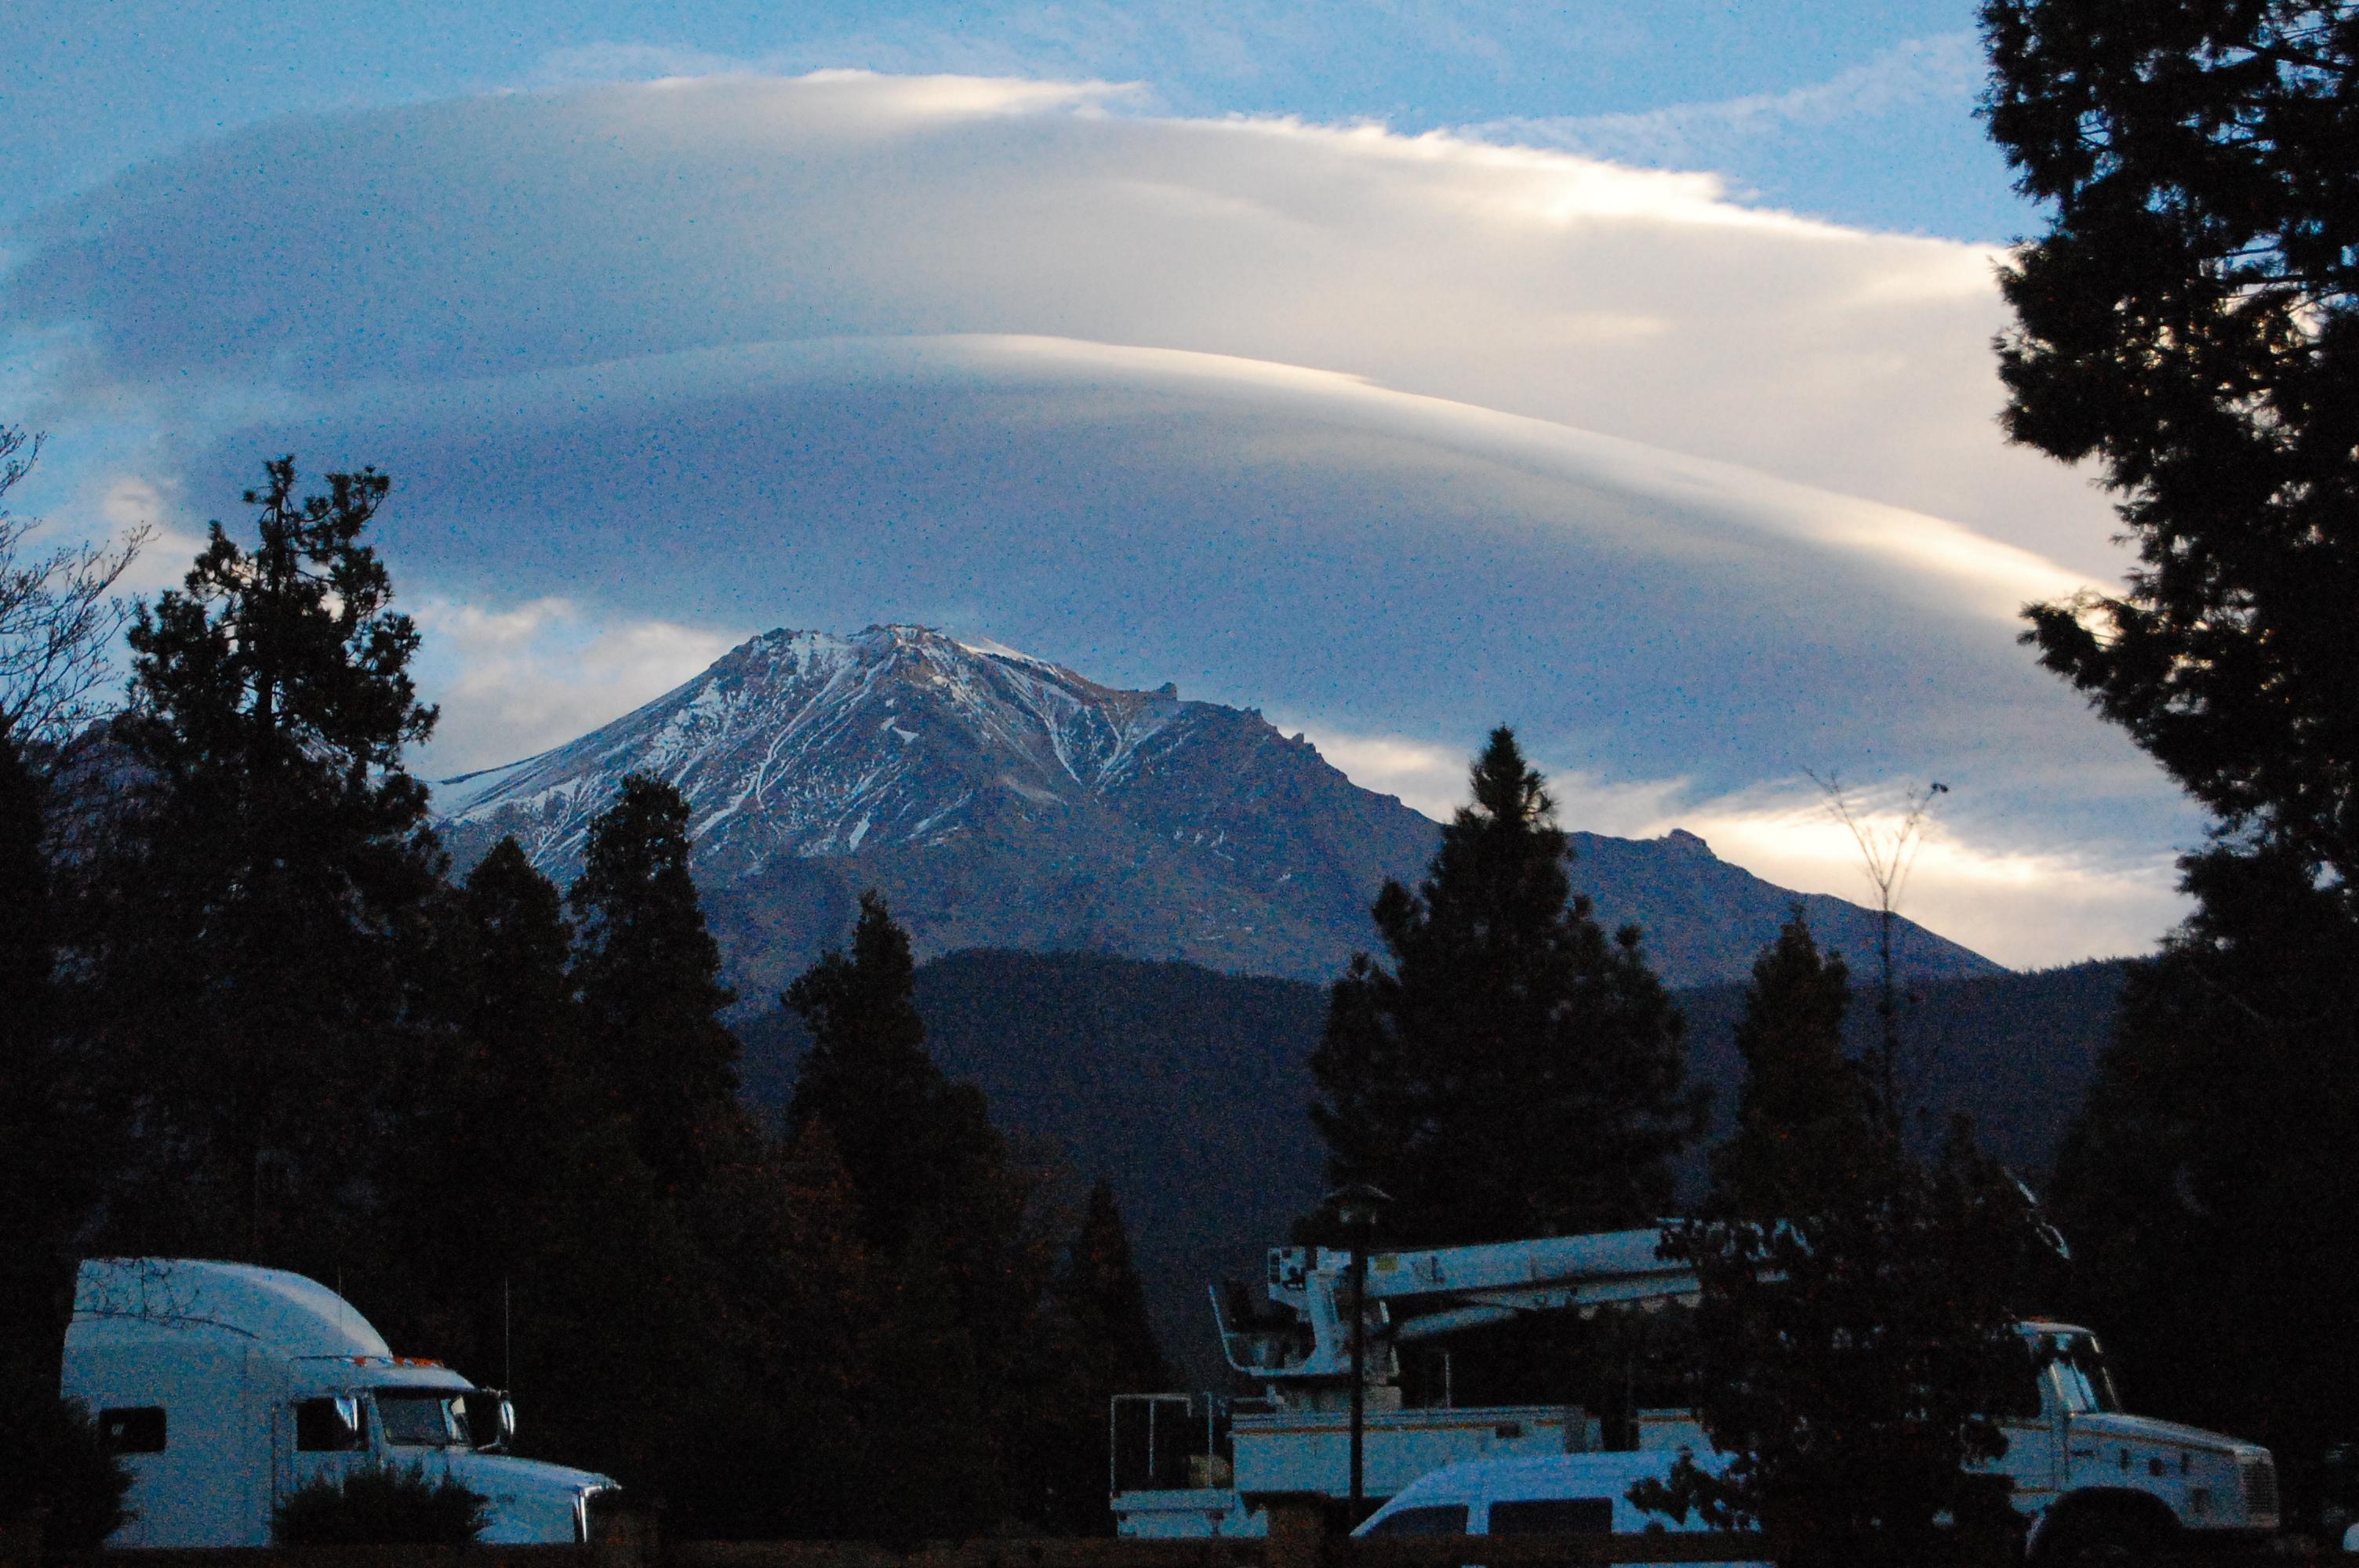 View of Mount Shasta